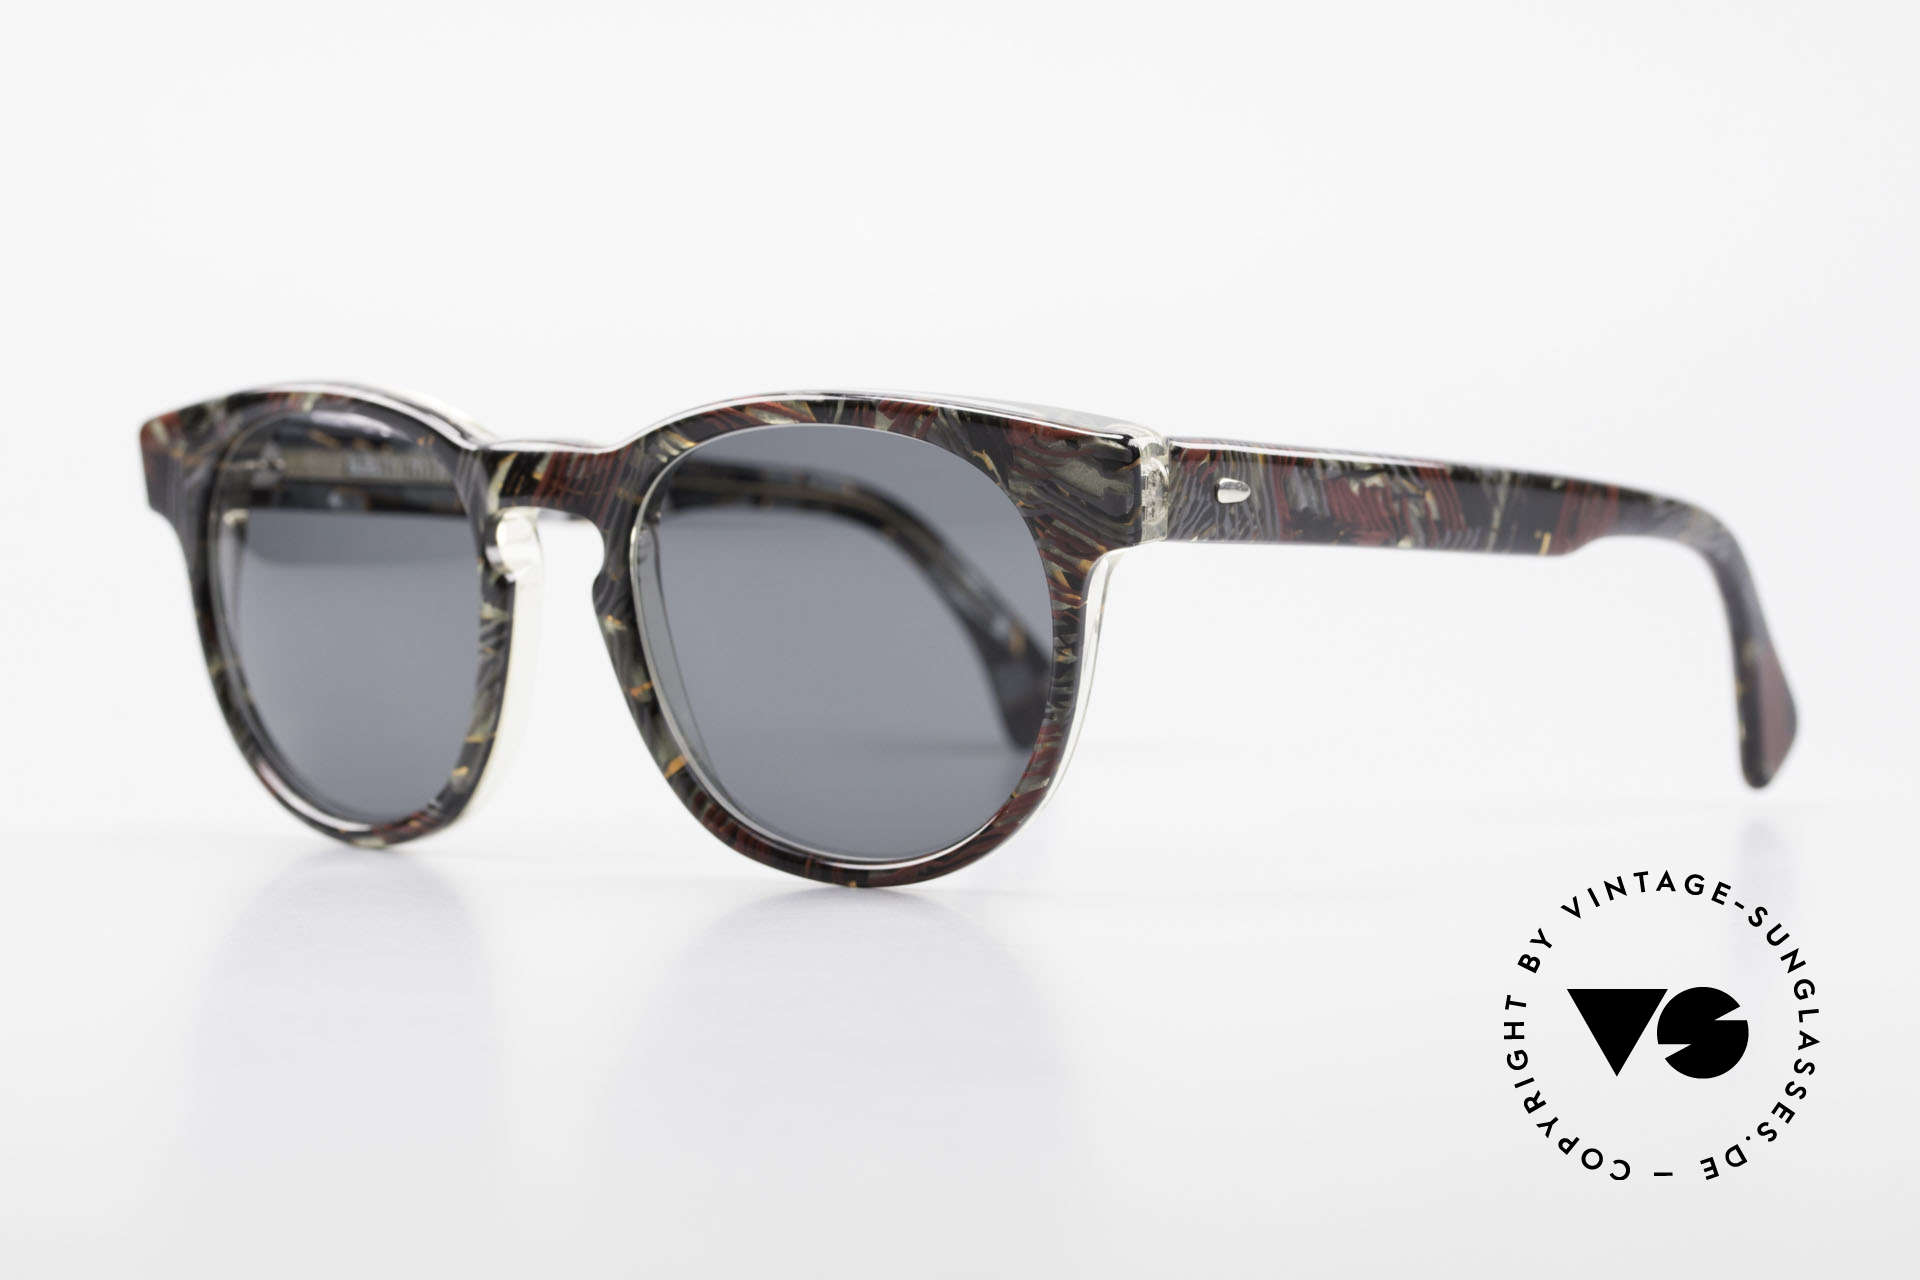 Alain Mikli 903 / 685 Panto Frame Gray Patterned, inspired by the 1960's 'Tart Optical Arnel' frames, Made for Men and Women